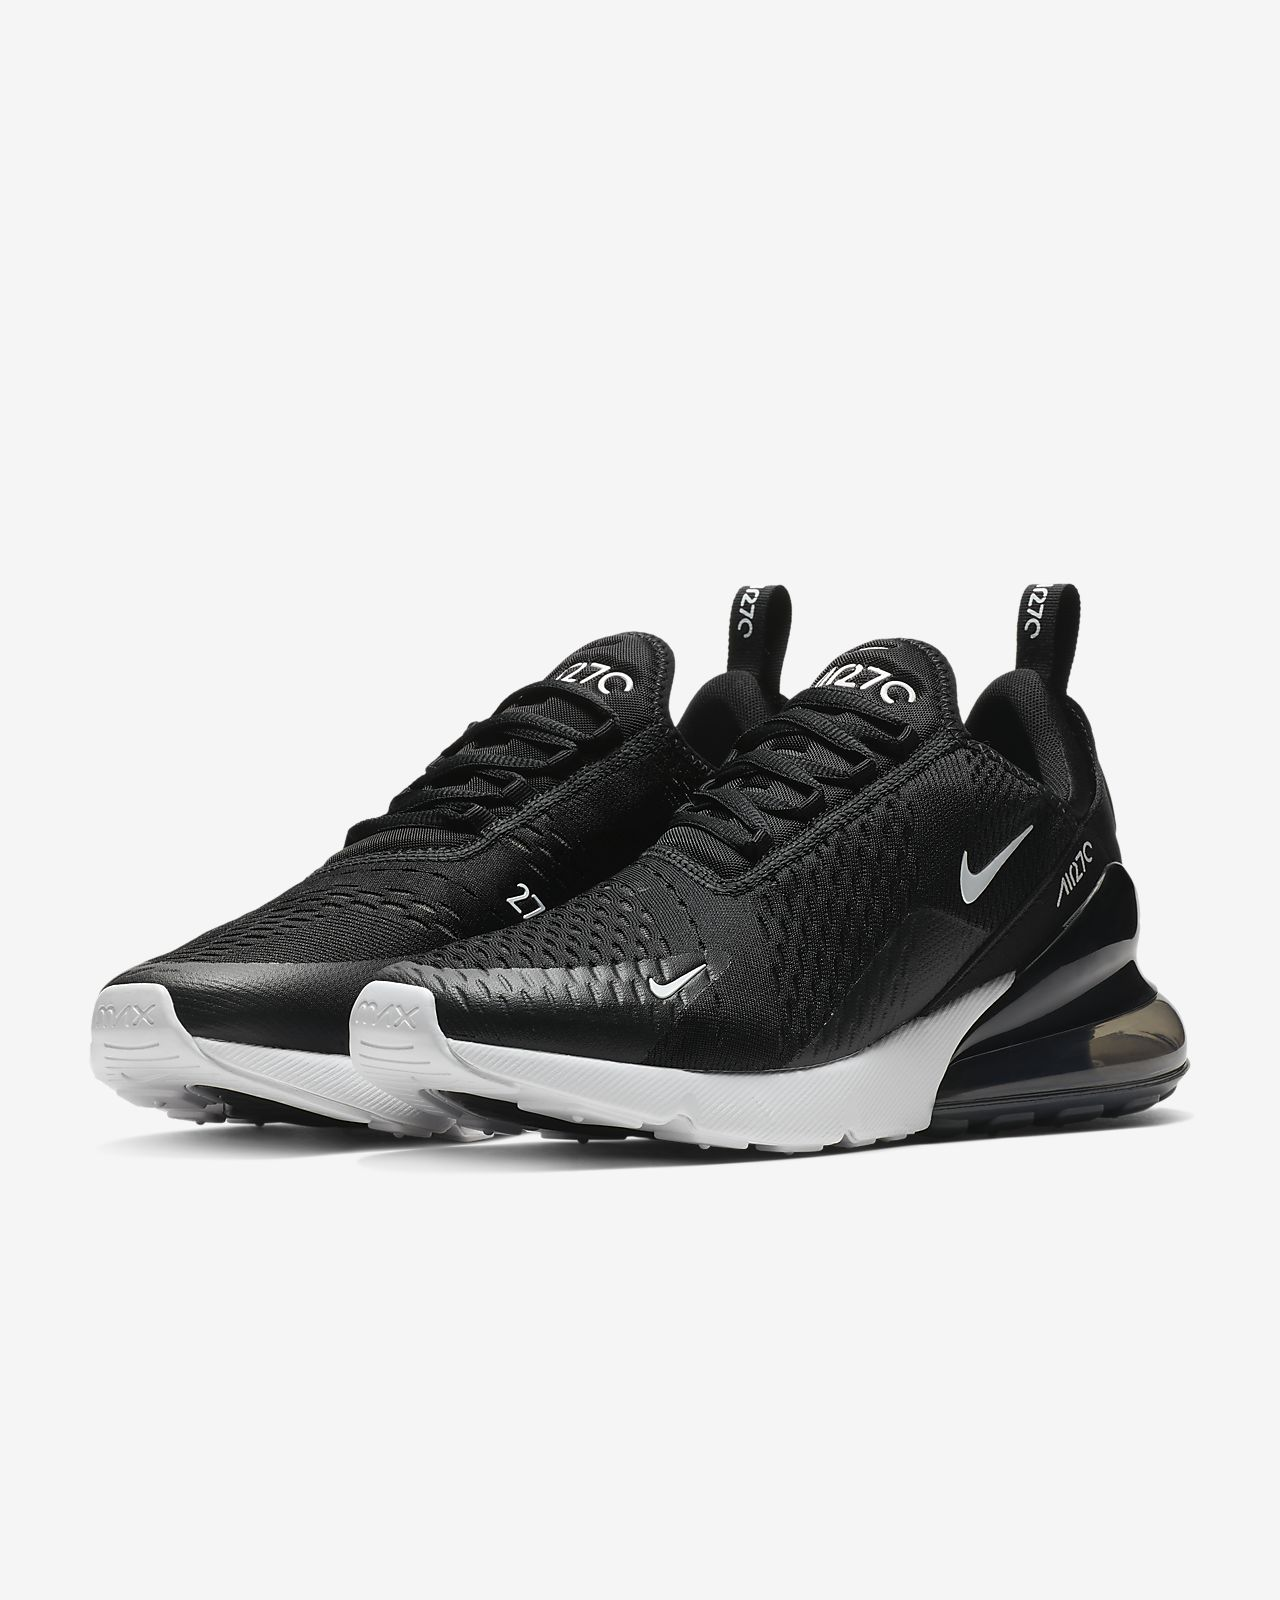 Chaussure Max Air Nike pour 270 Femme K1clTFJ3